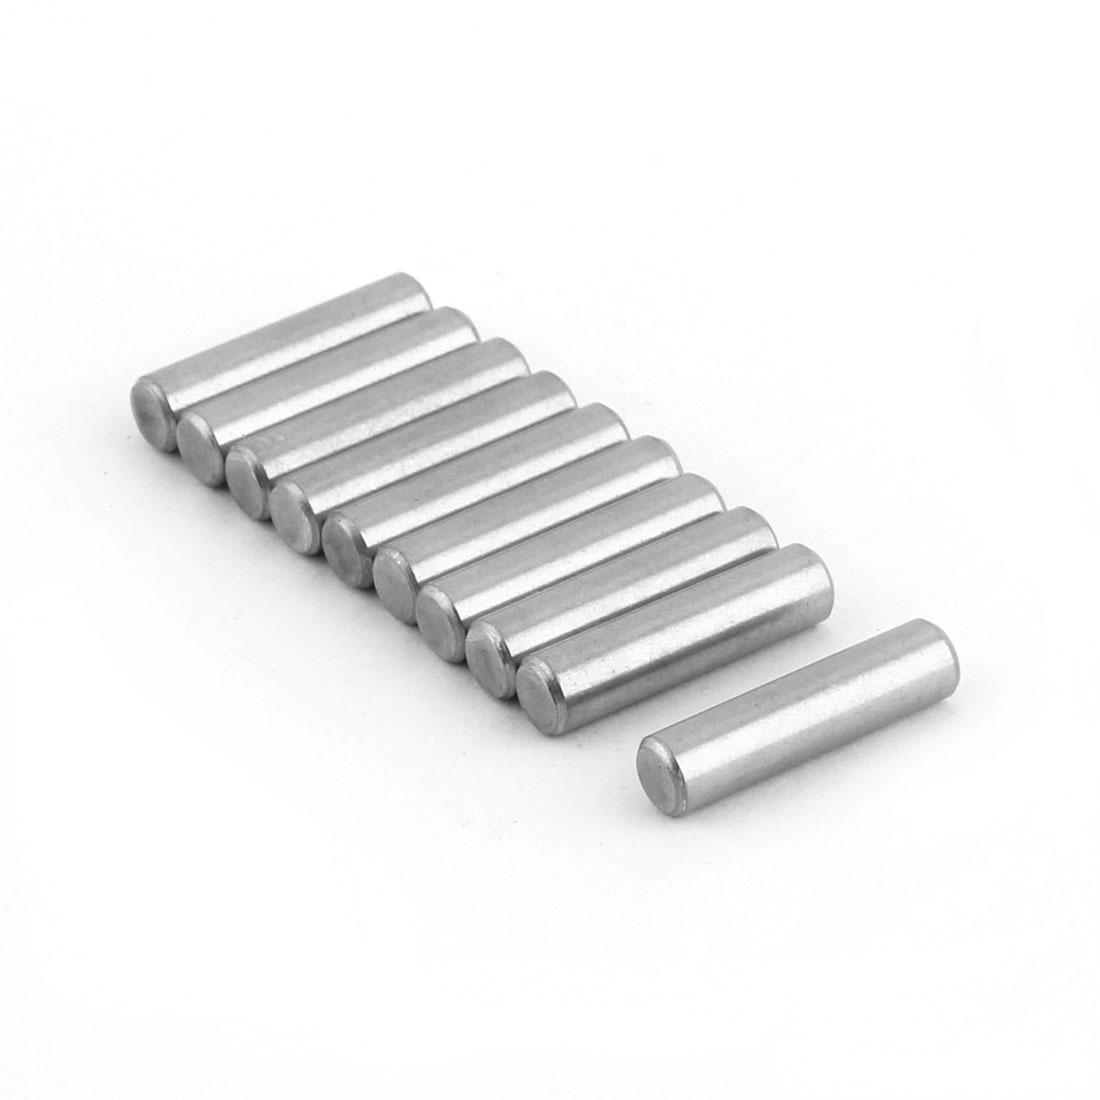 304 Stainless Steel Round Solid Dowel Pins Fastener Elements 0.2 x 0.8 Inch